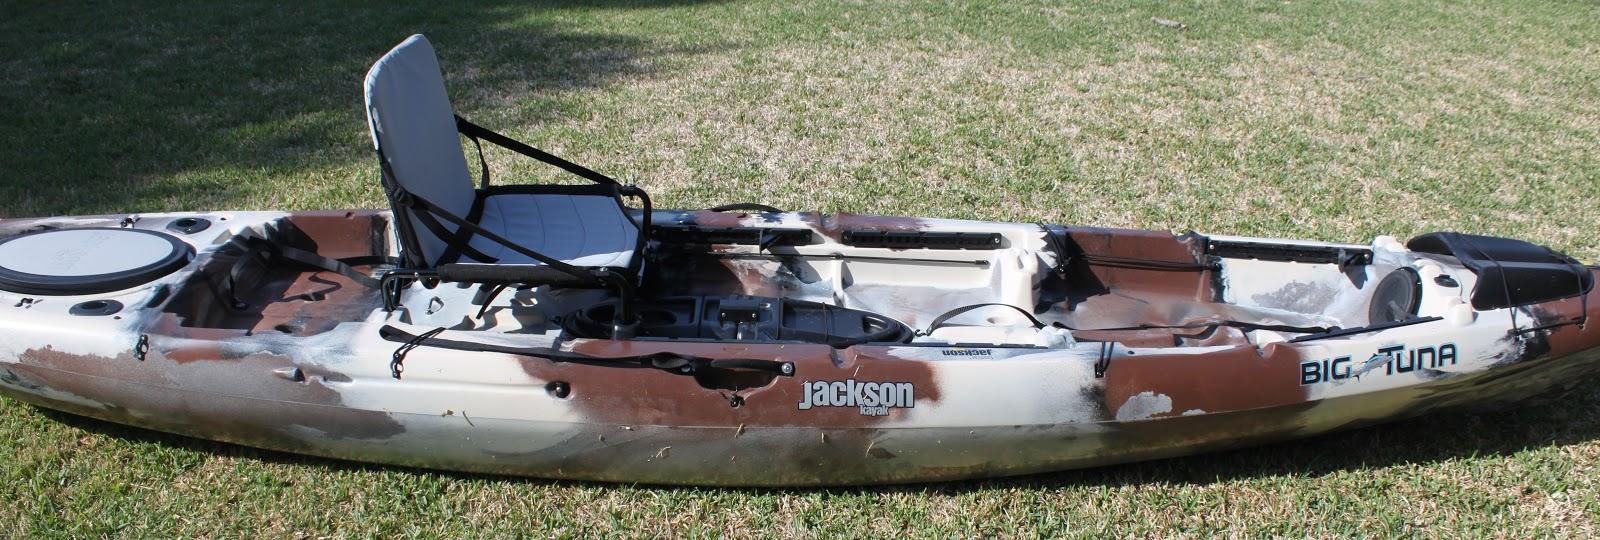 Jackson Kayak Big Tuna Review — Texas Kayak Fisher